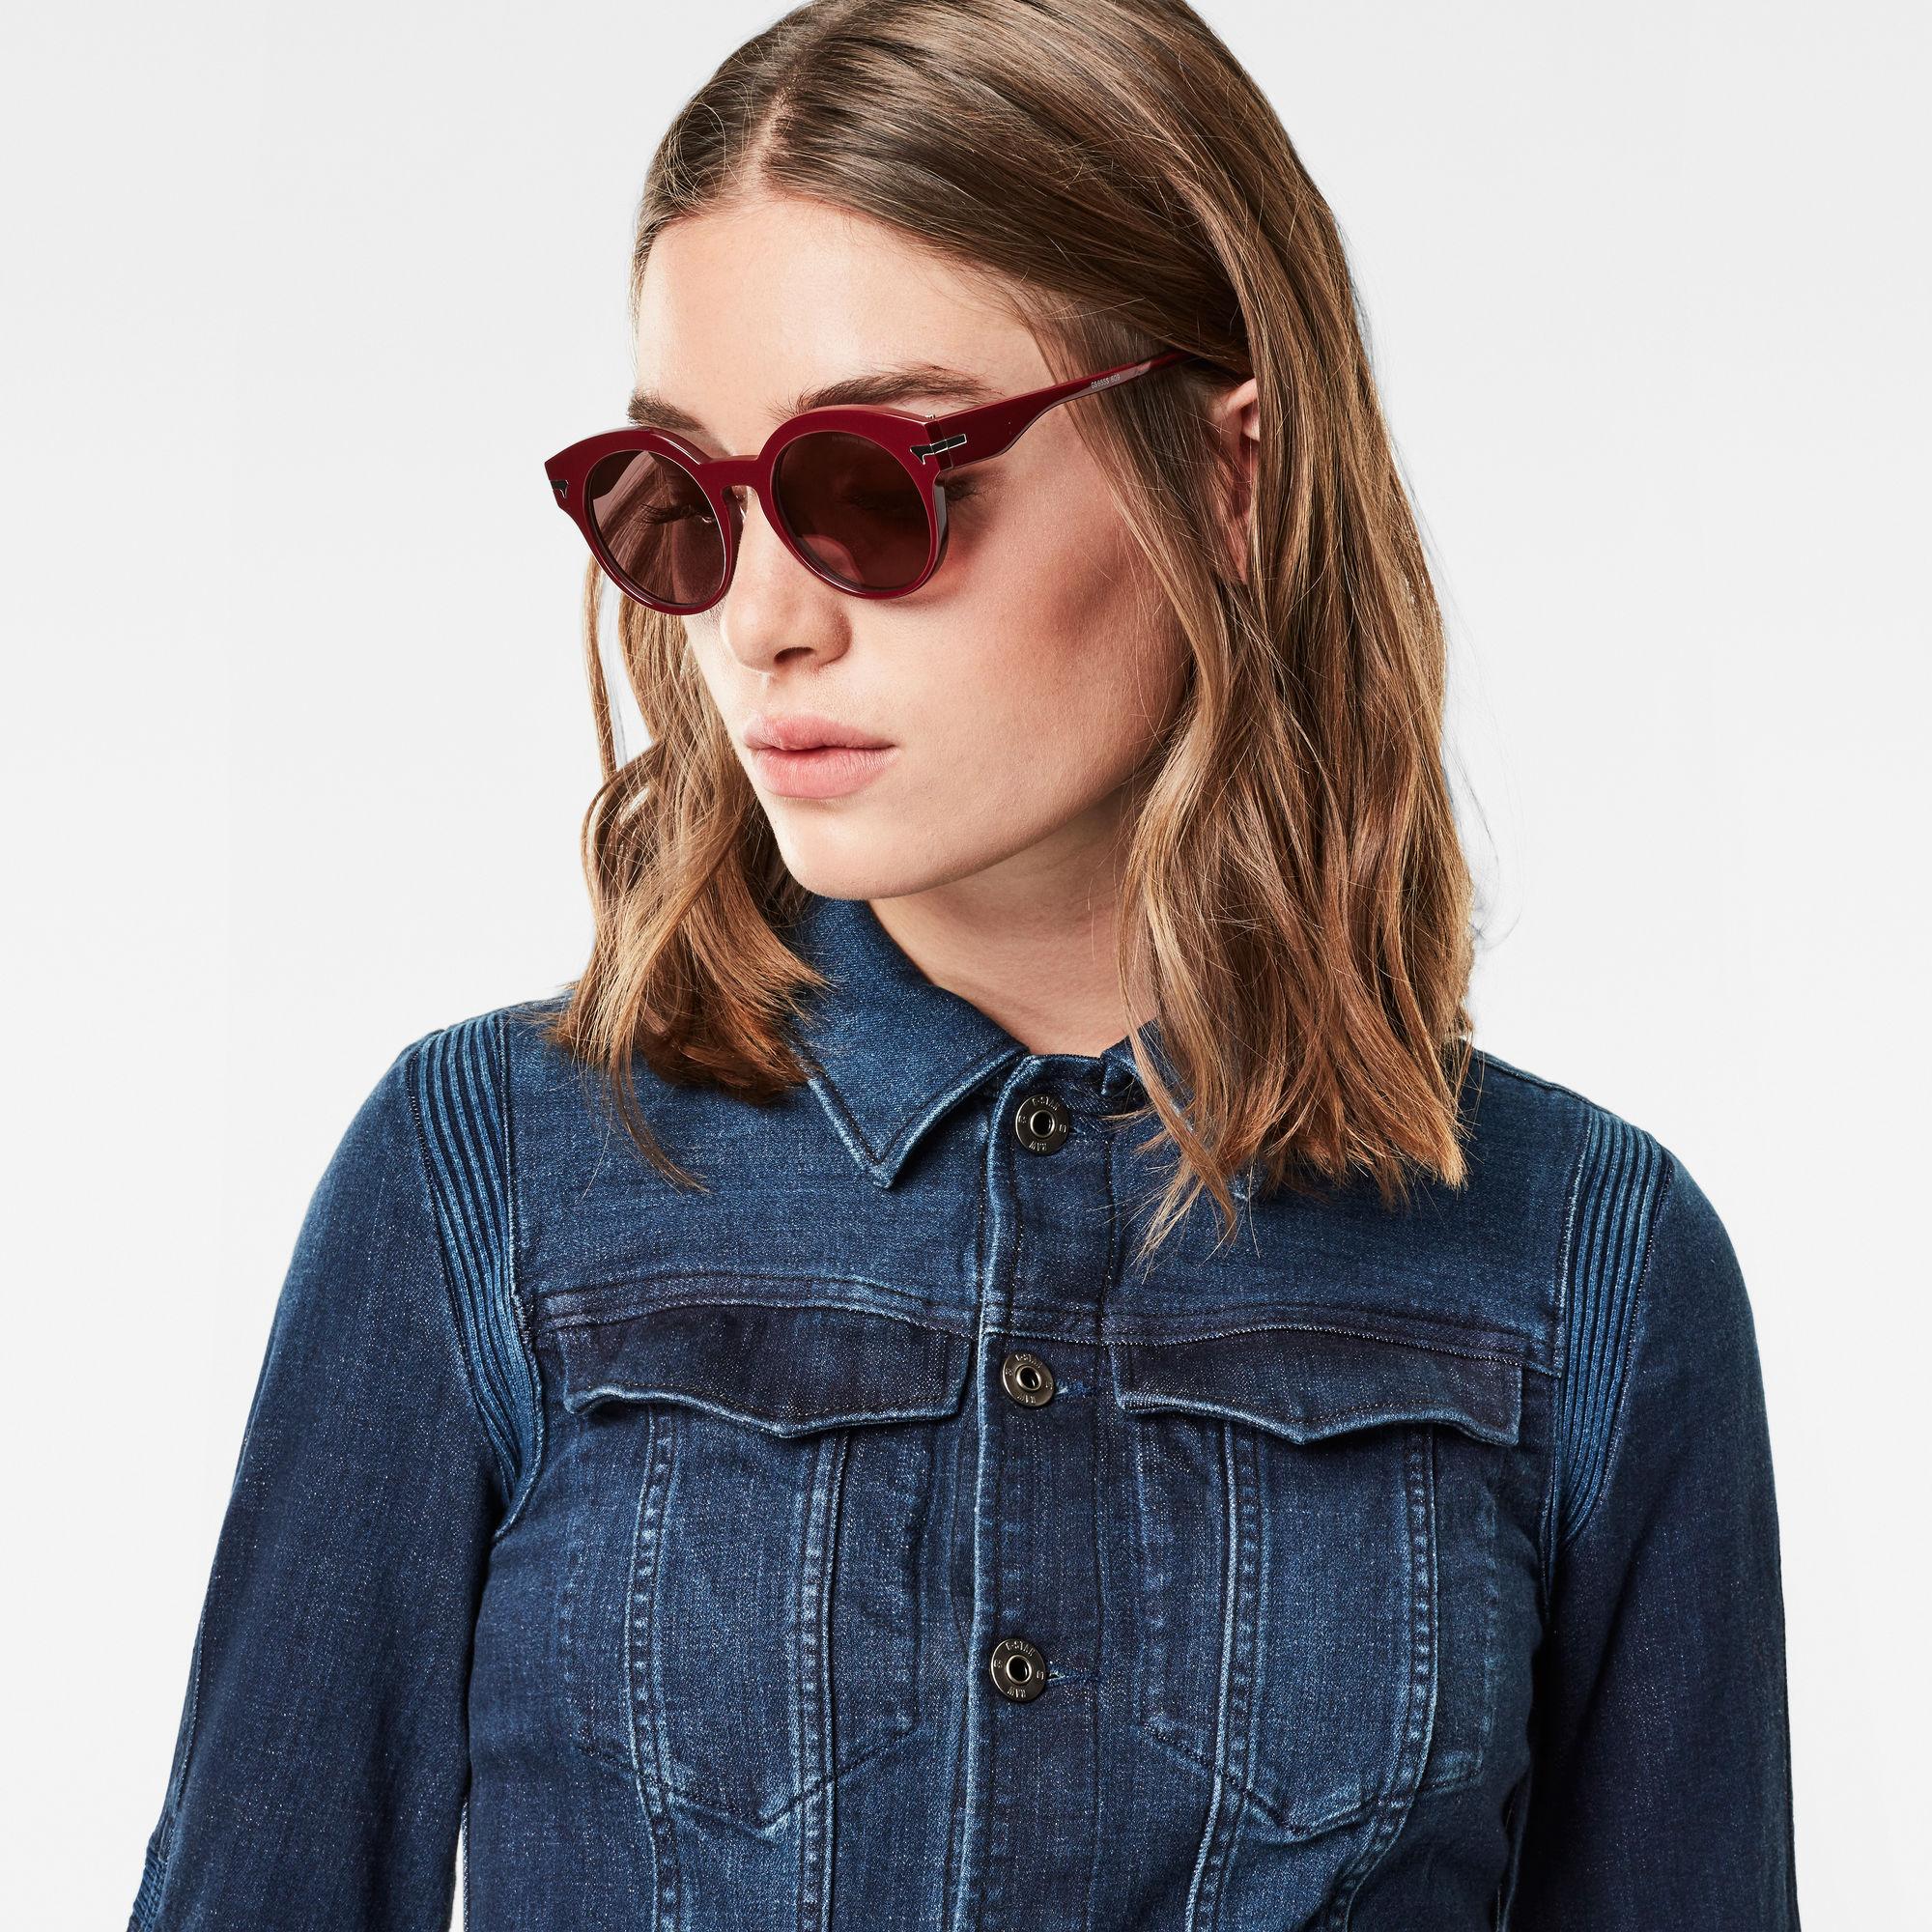 Fat Javkk Sunglasses